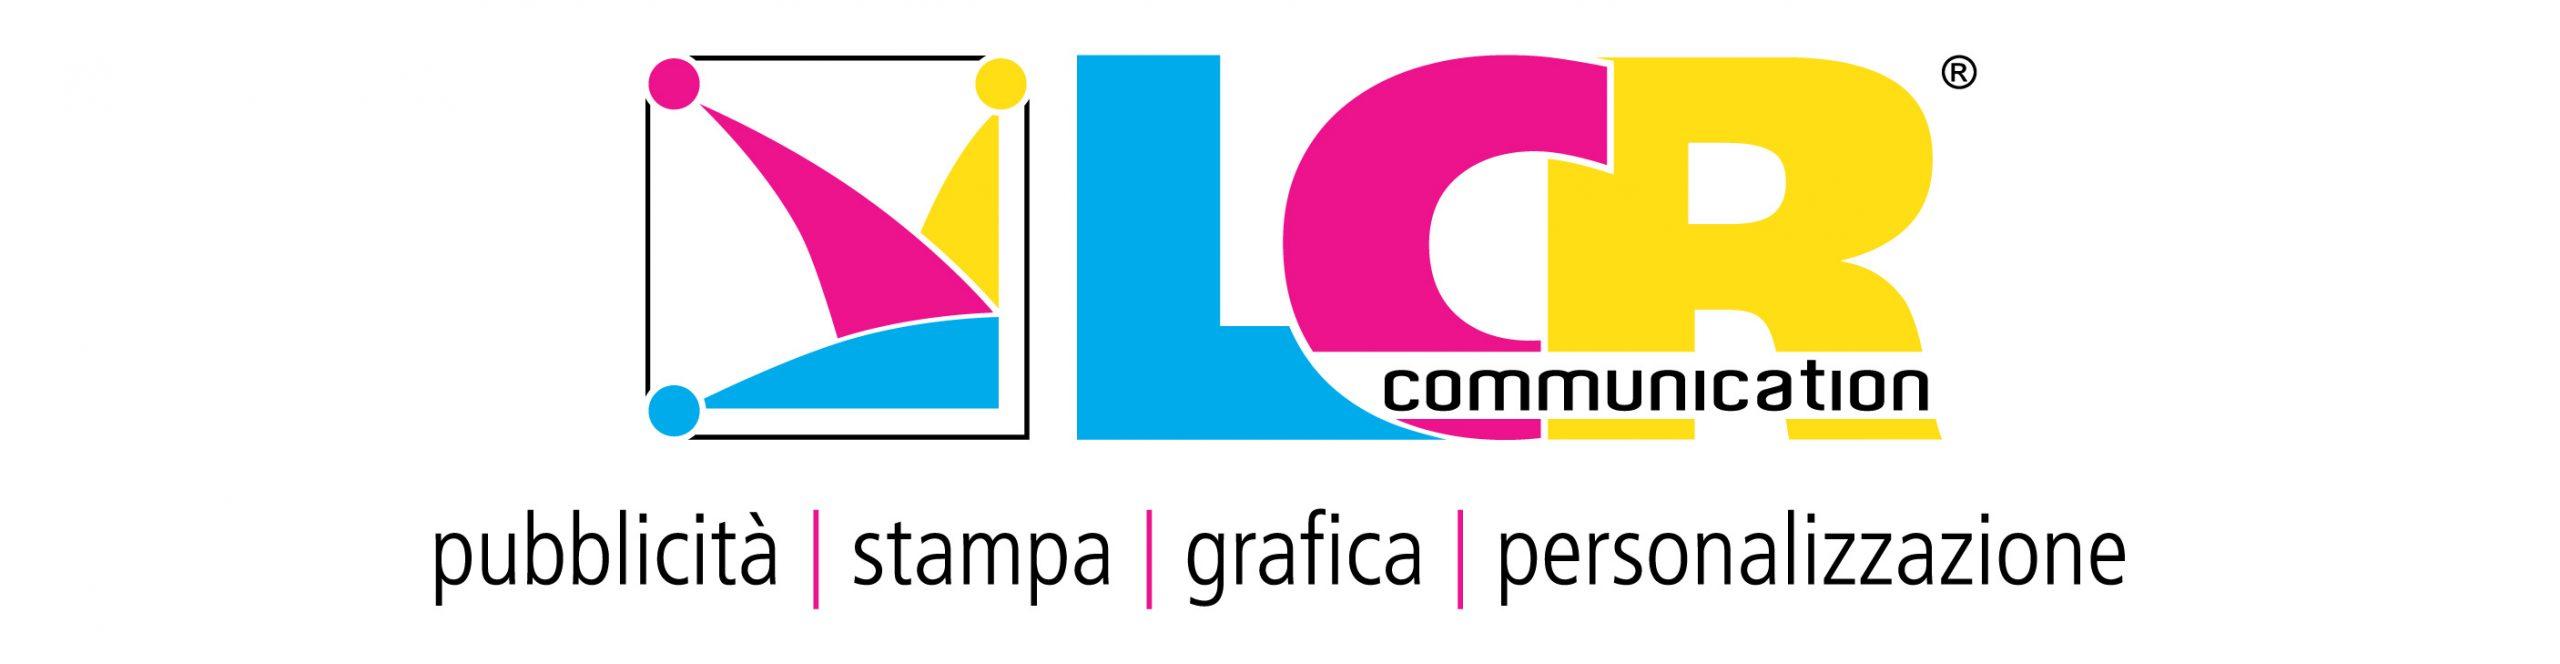 LCR Communication